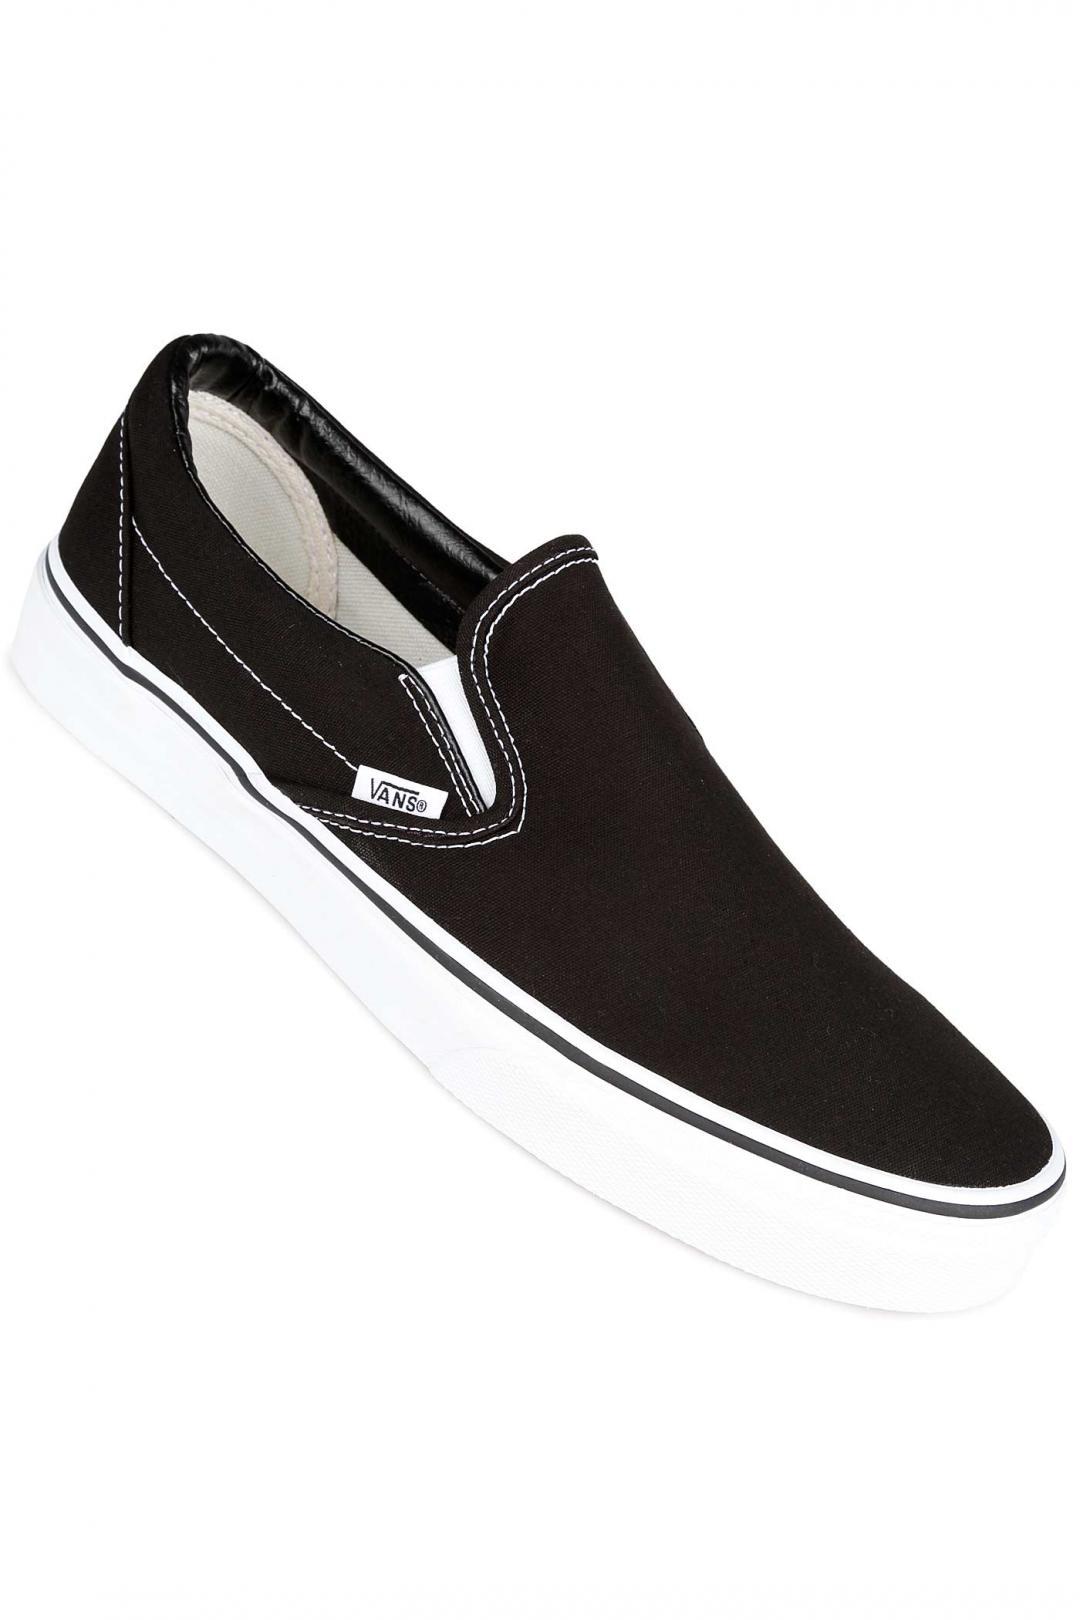 Uomo Vans Classic Slip-On black | Sneakers slip on